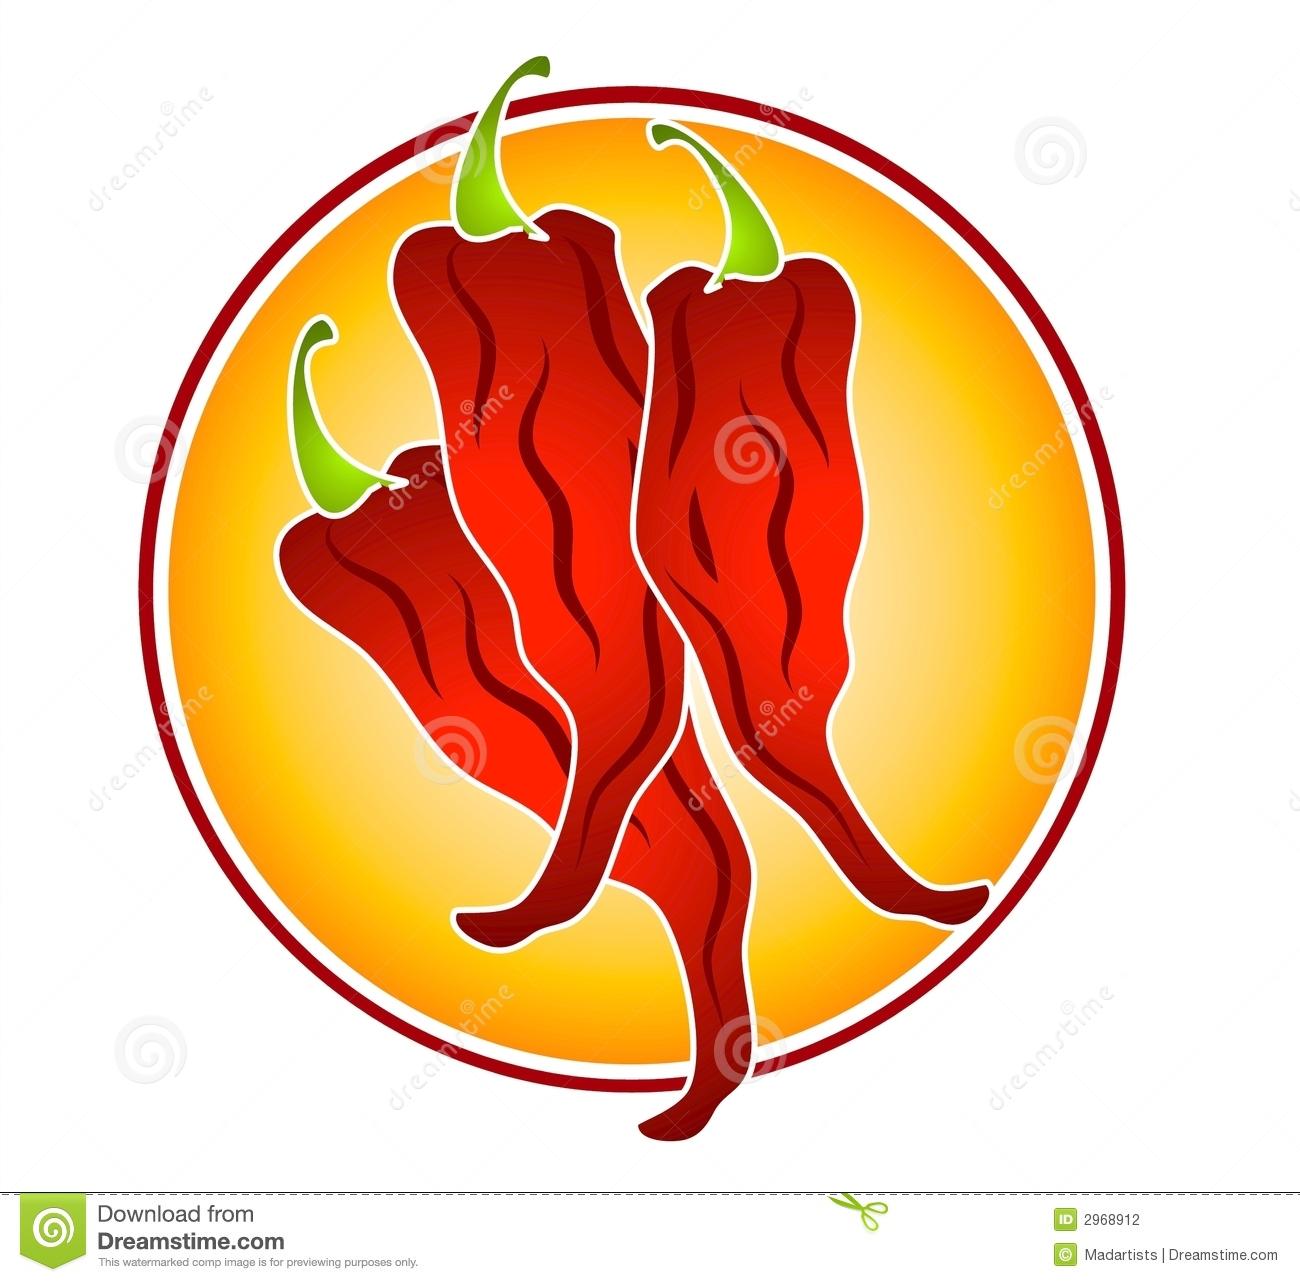 Red Chili Pepper Clipart.